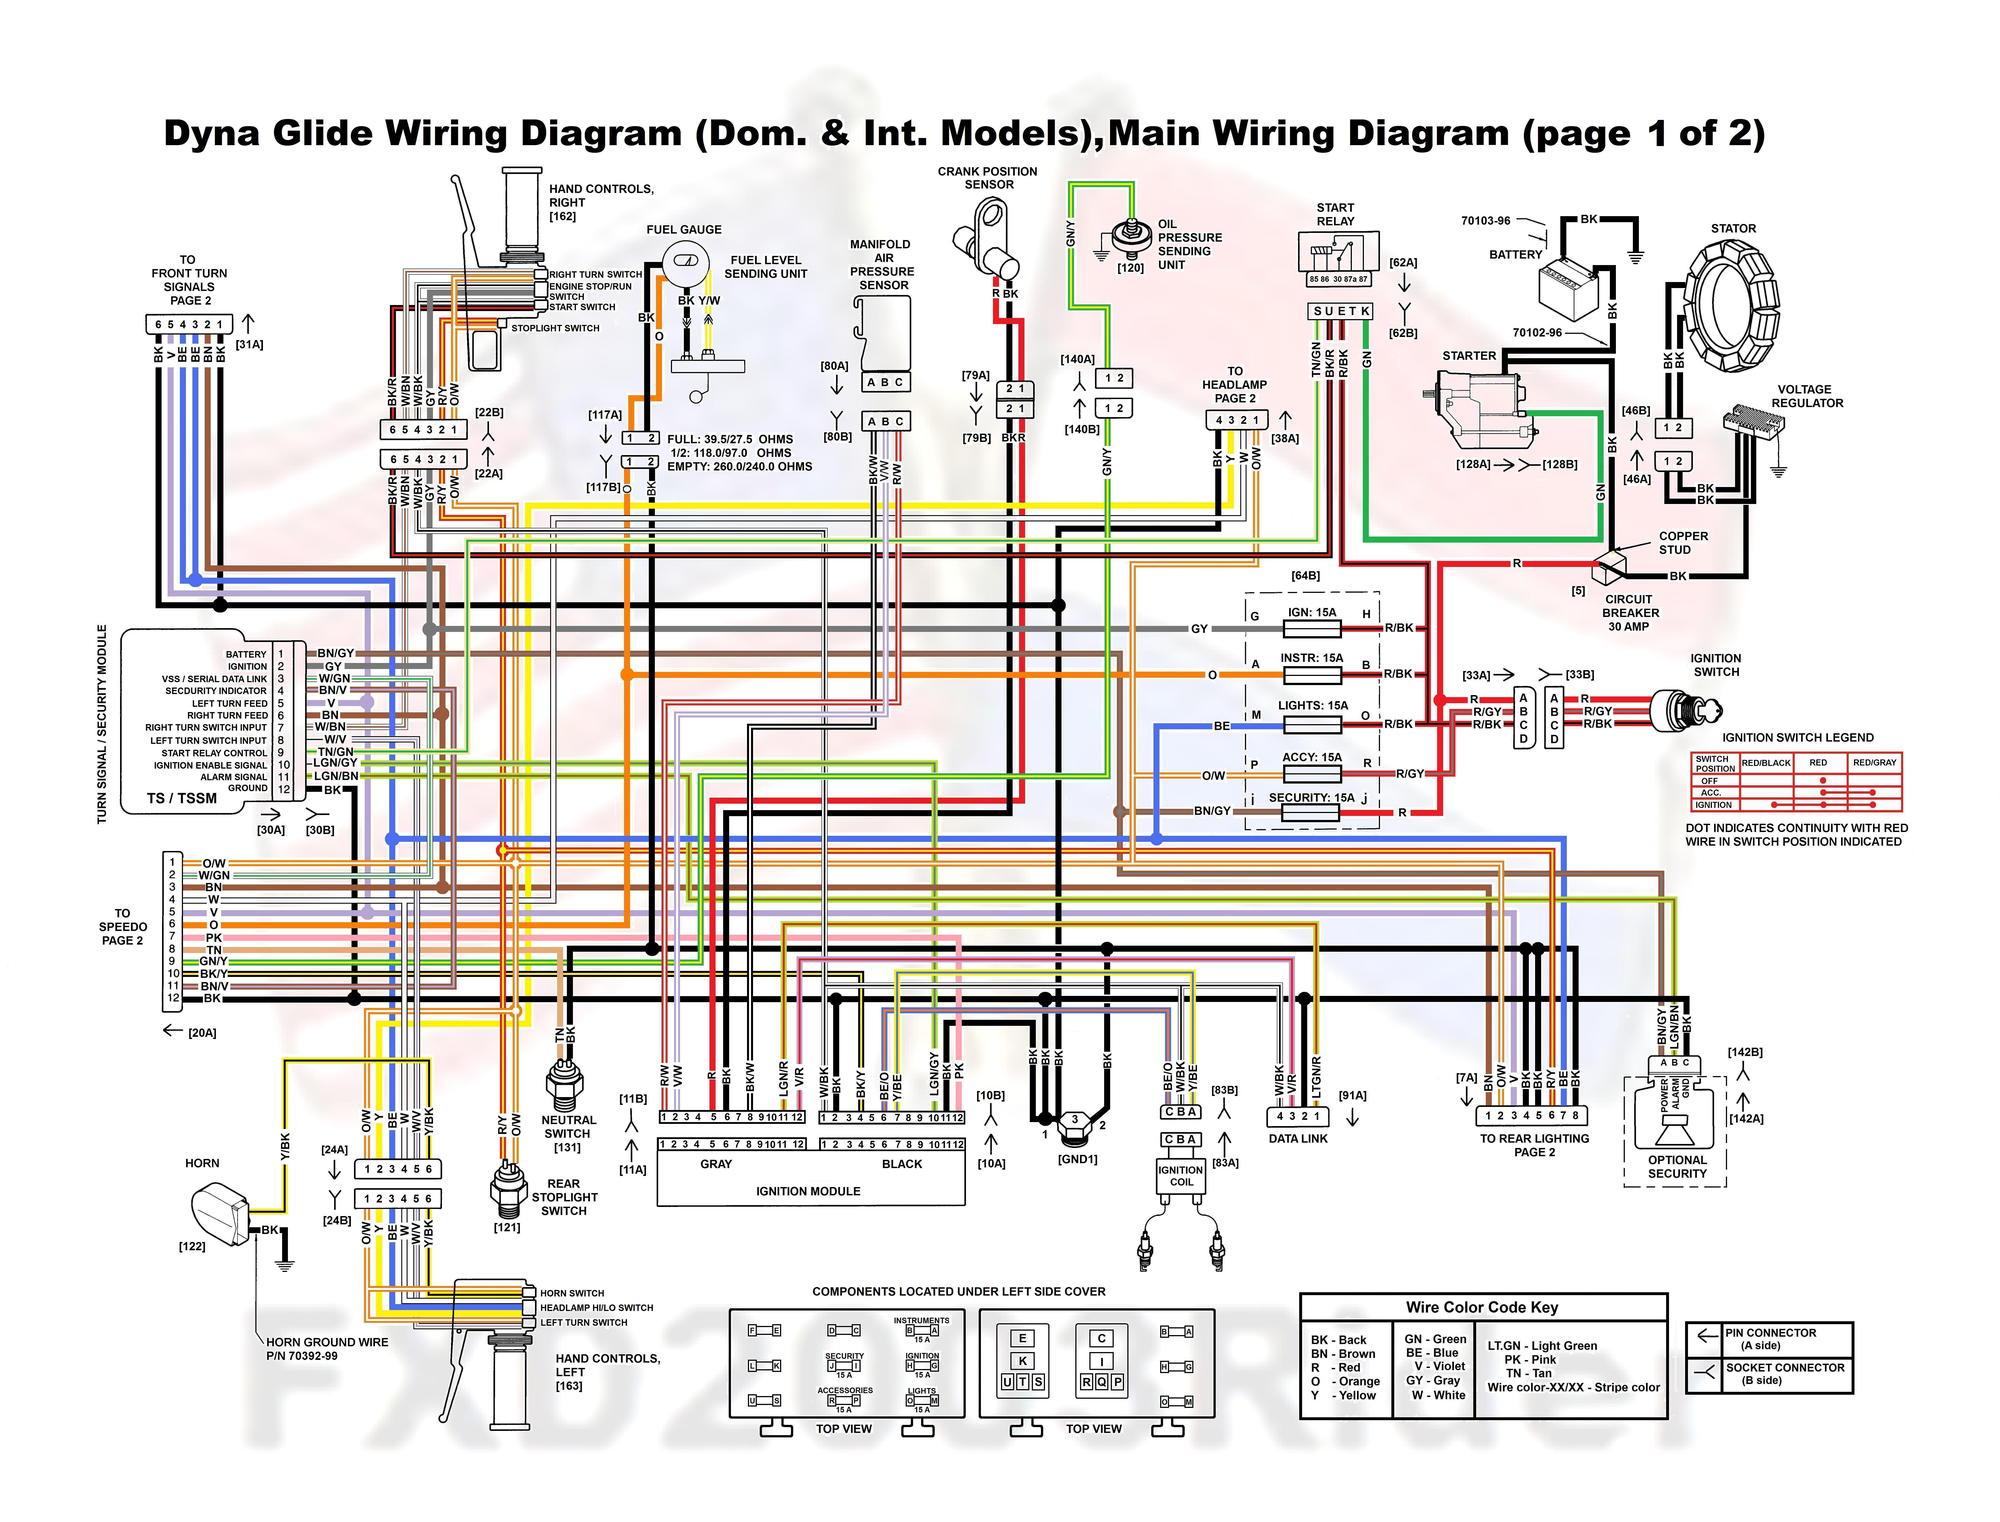 Buell Wiring Diagram - 3 Way Lighting Circuit Wiring Diagram for Wiring  Diagram SchematicsWiring Diagram Schematics